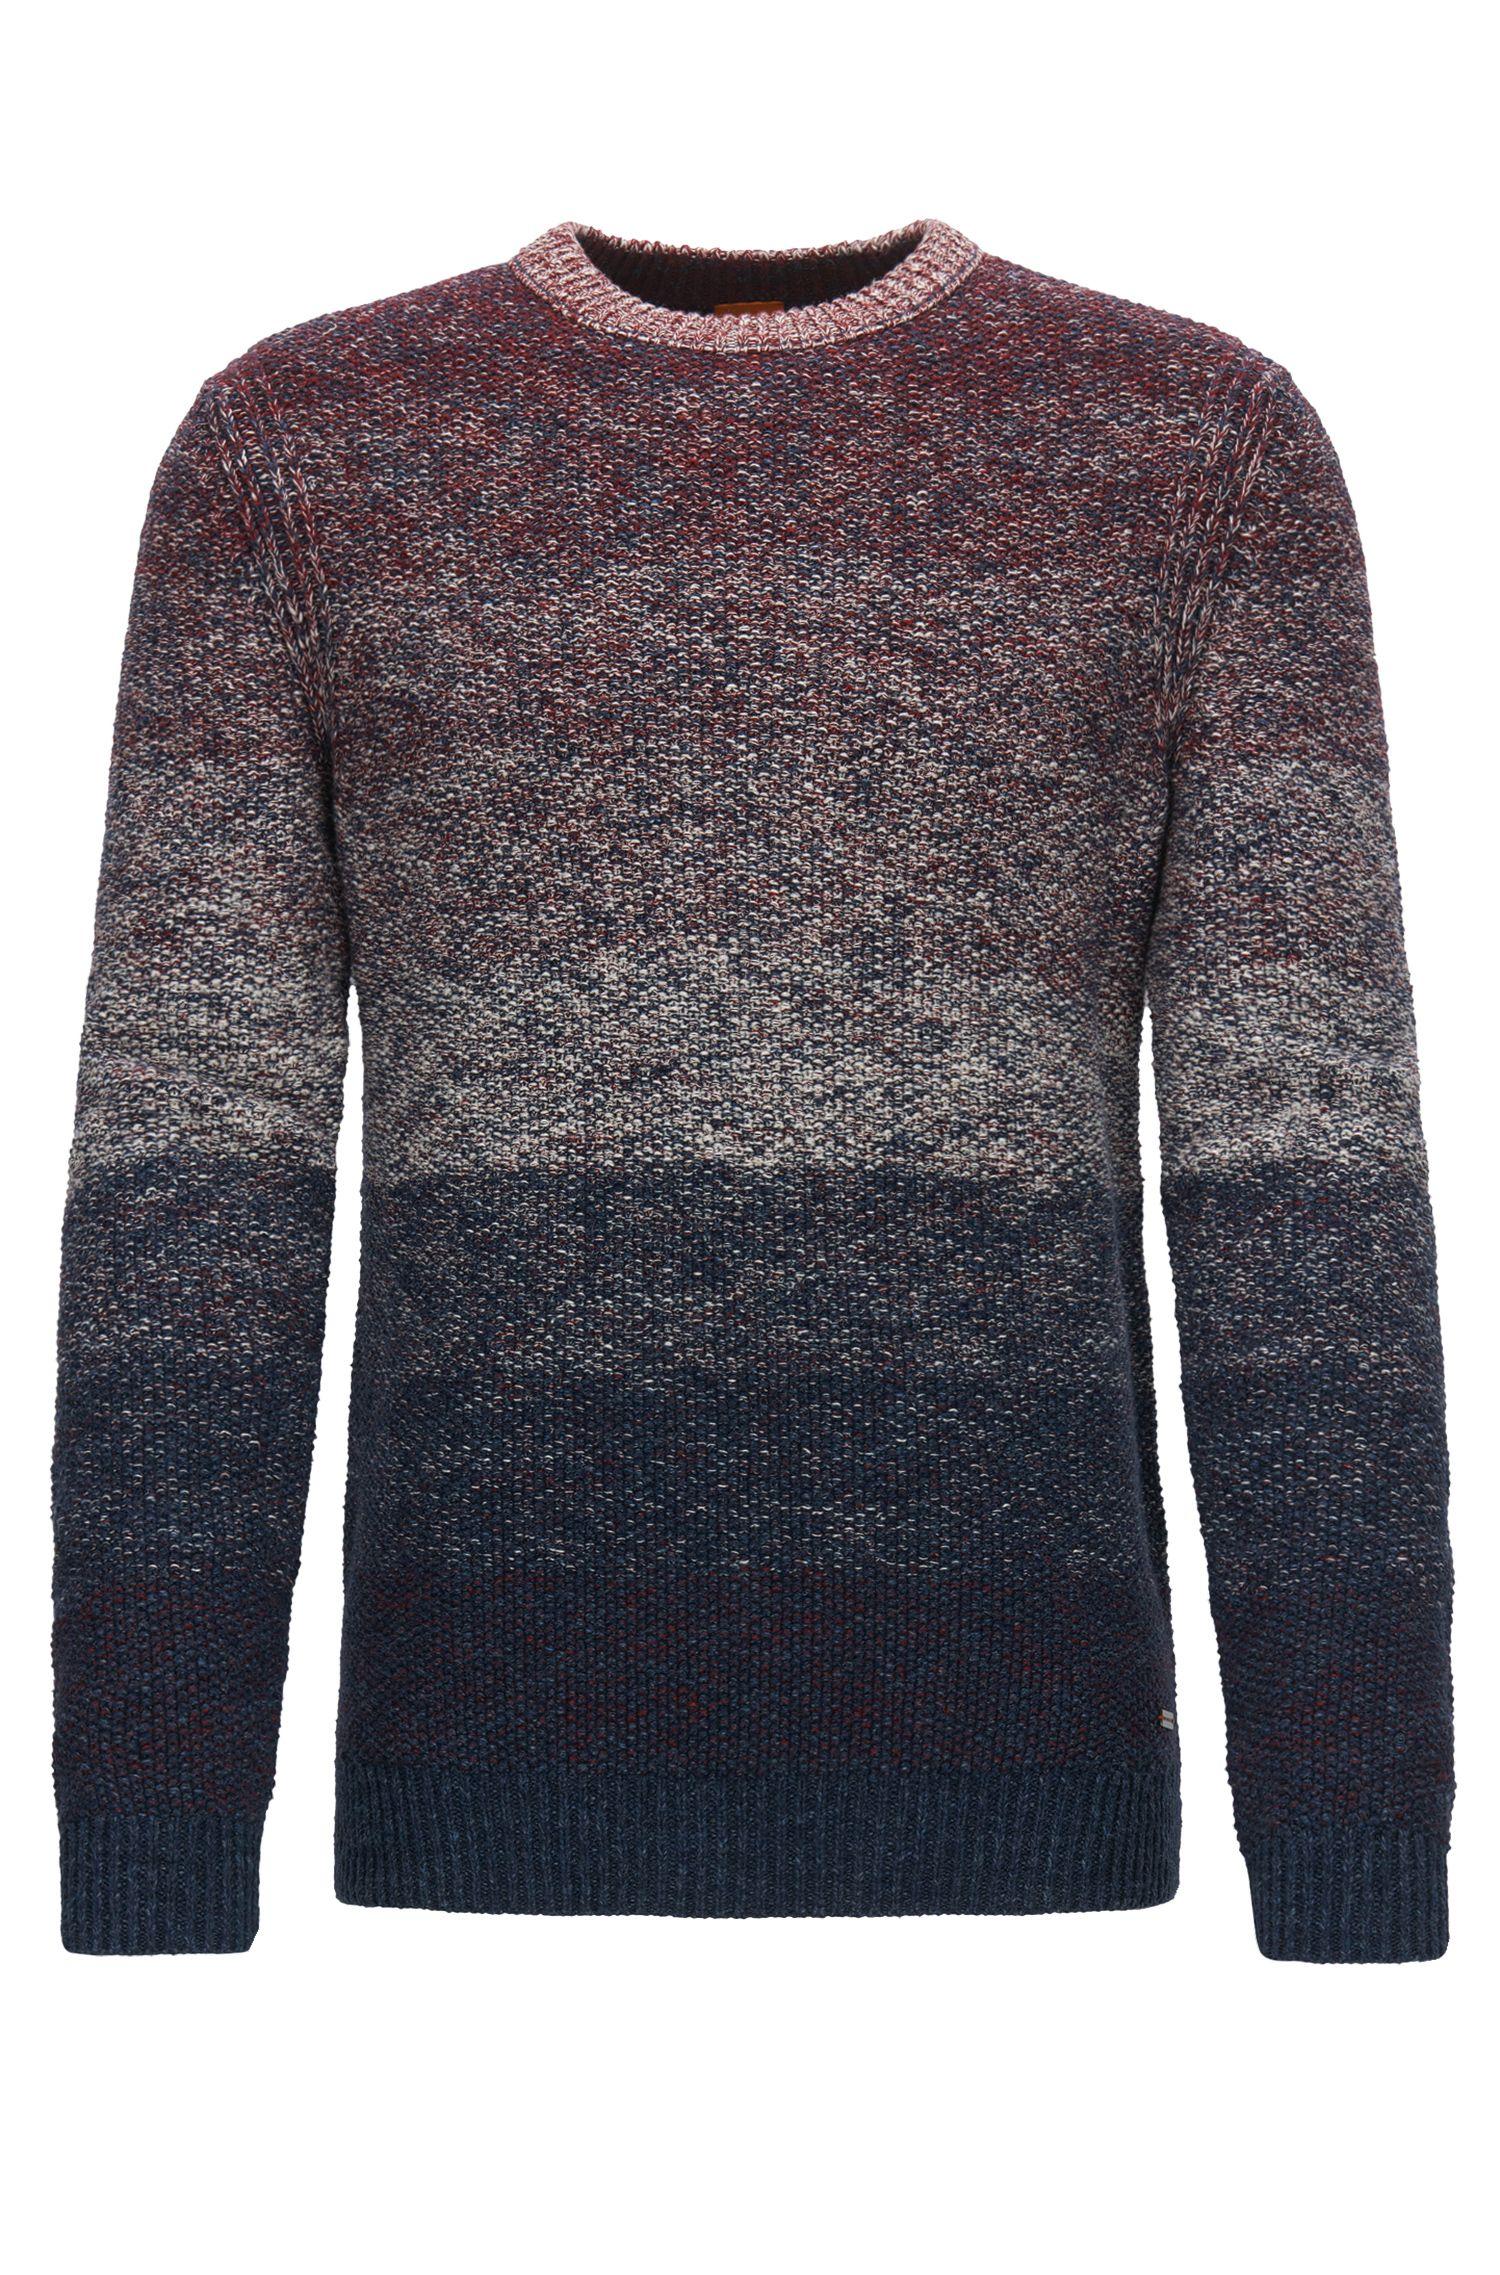 Crew-neck sweater in dégradée cotton